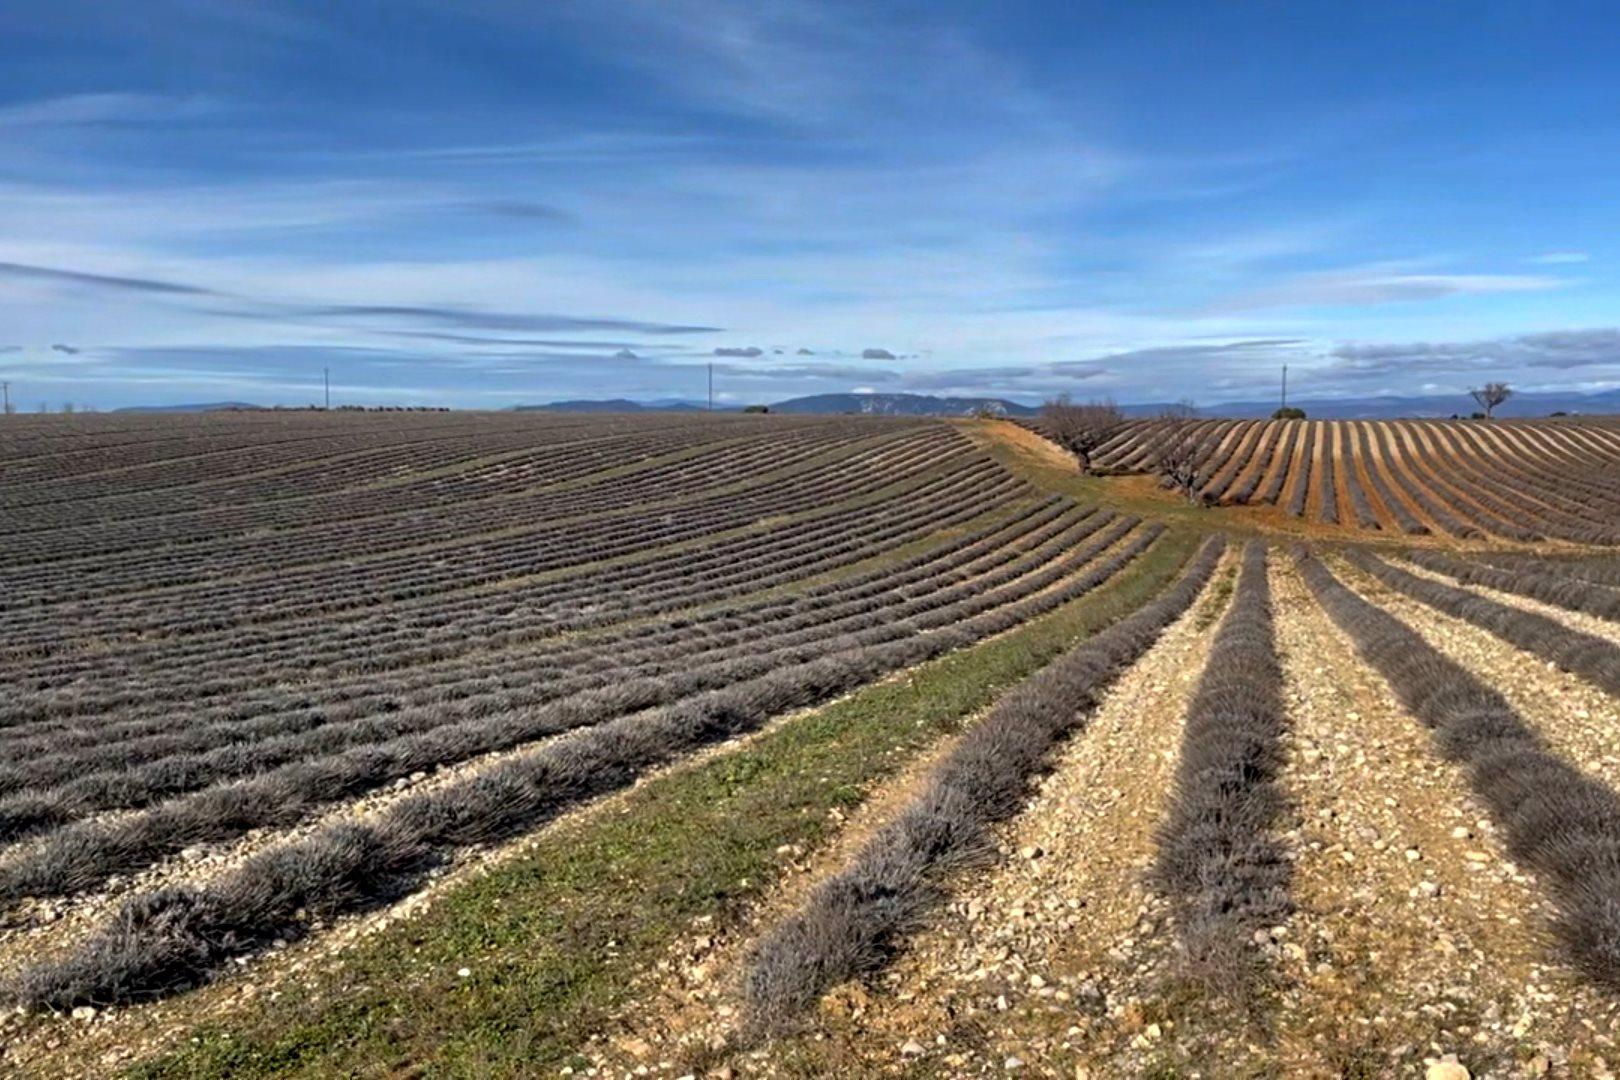 Lavendel, Lavendelhonig, Plateau de Valensole, Lavendelfelder